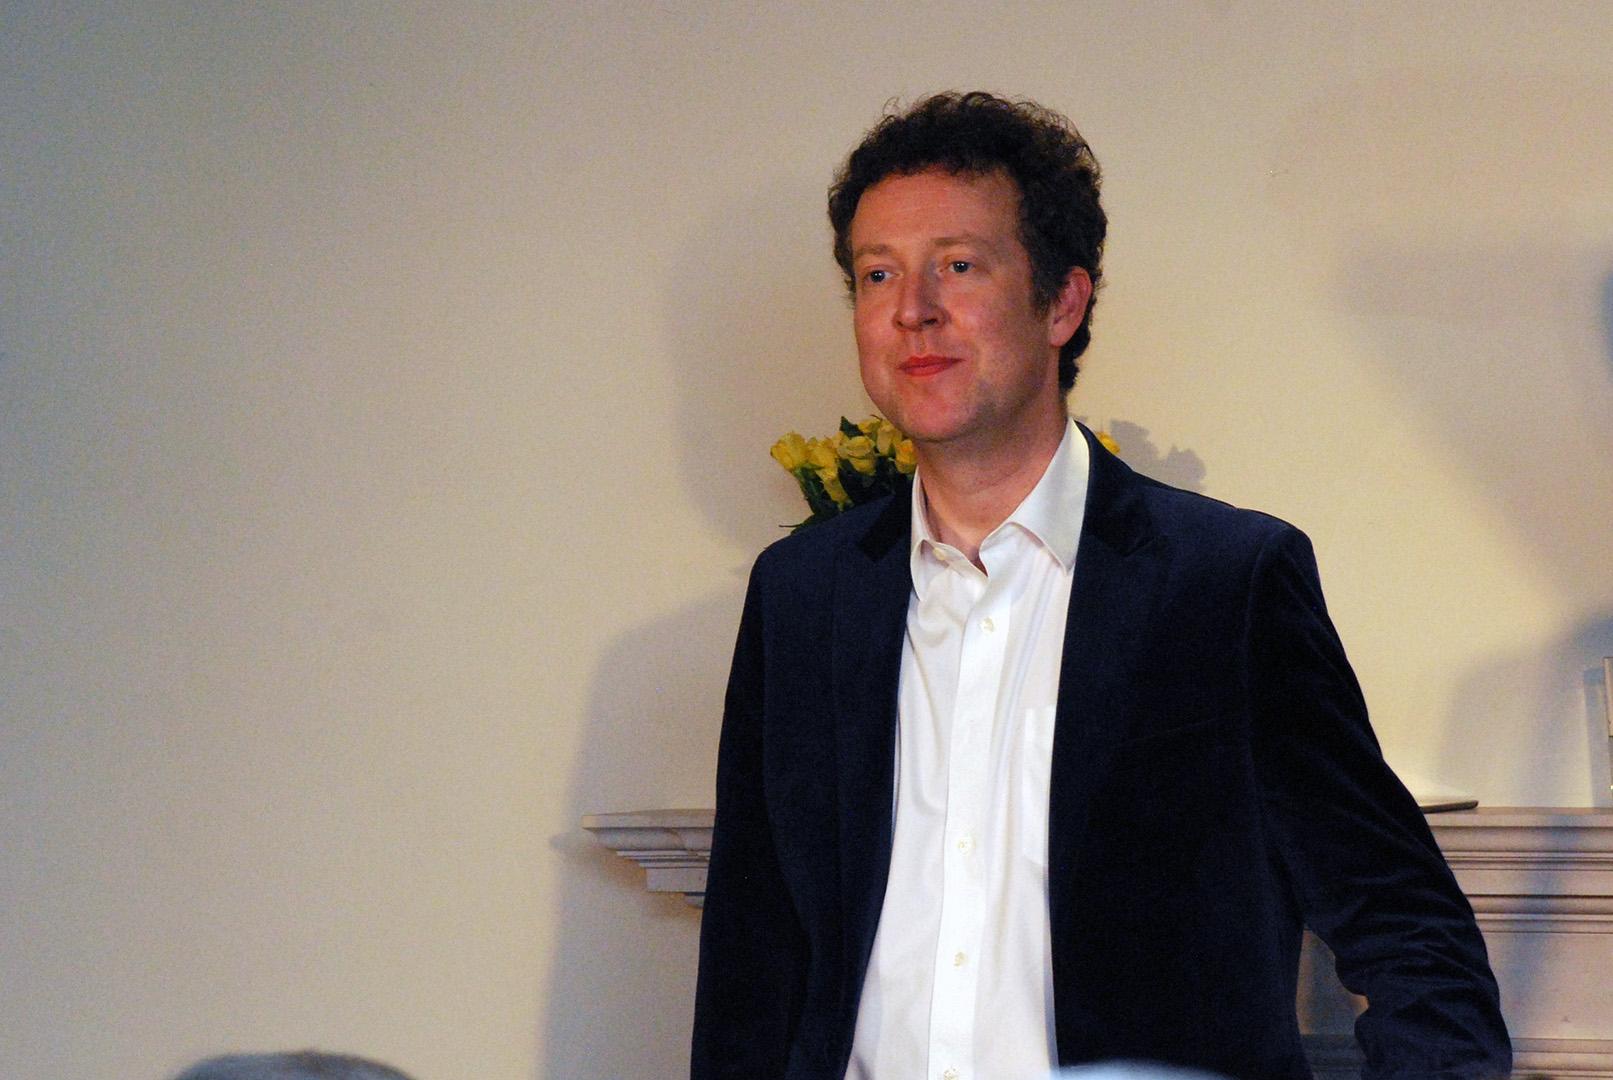 Sam Haywood at Breinton